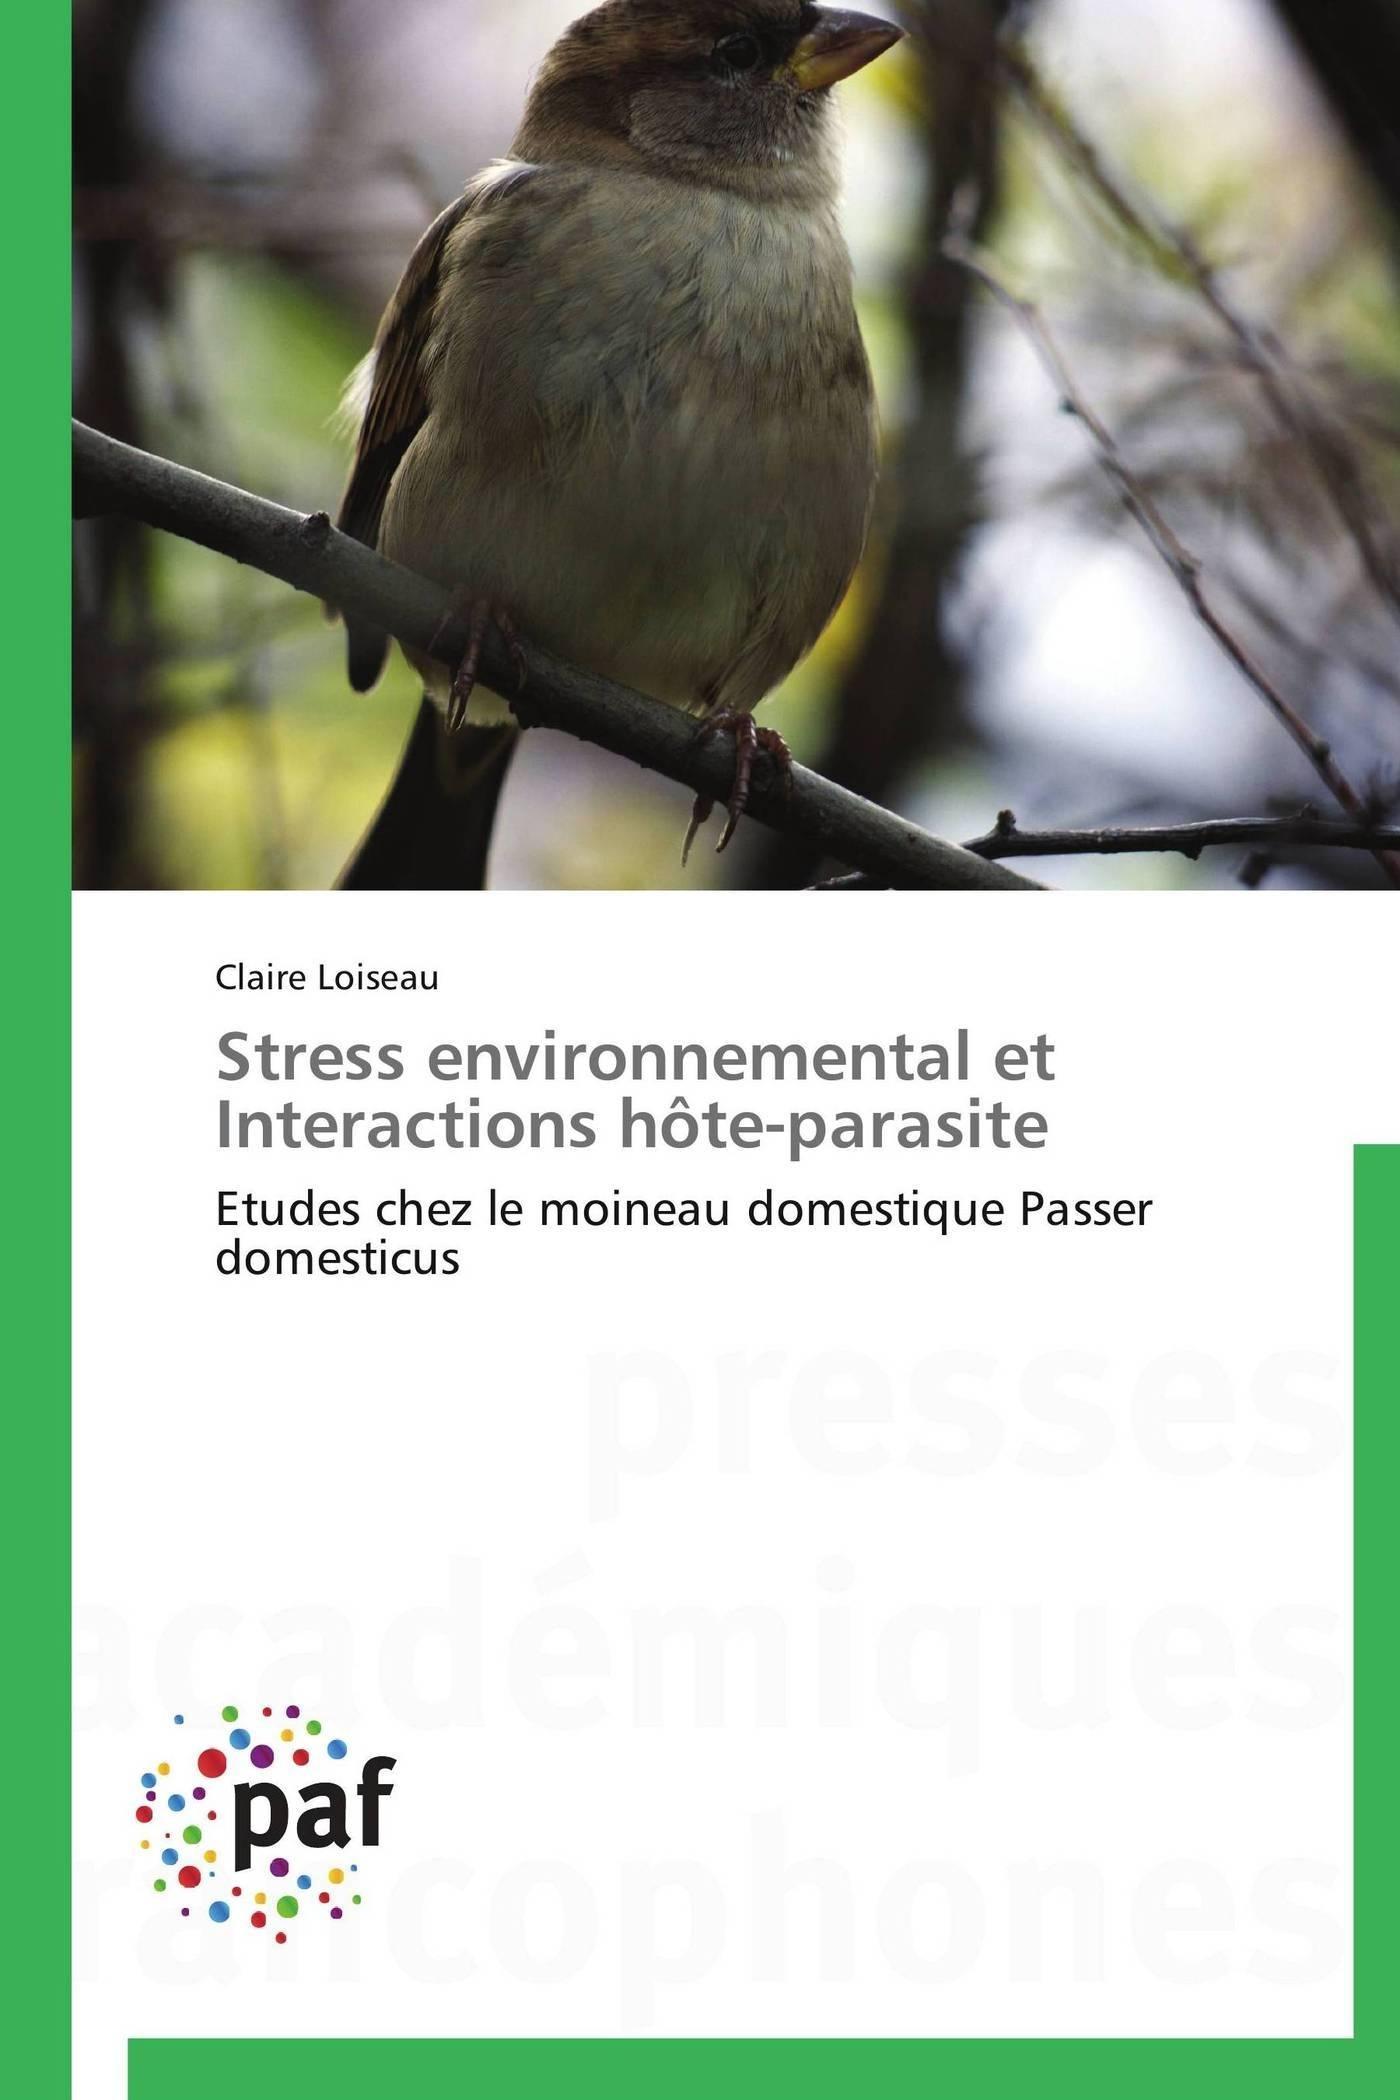 STRESS ENVIRONNEMENTAL ET INTERACTIONS HOTE-PARASITE